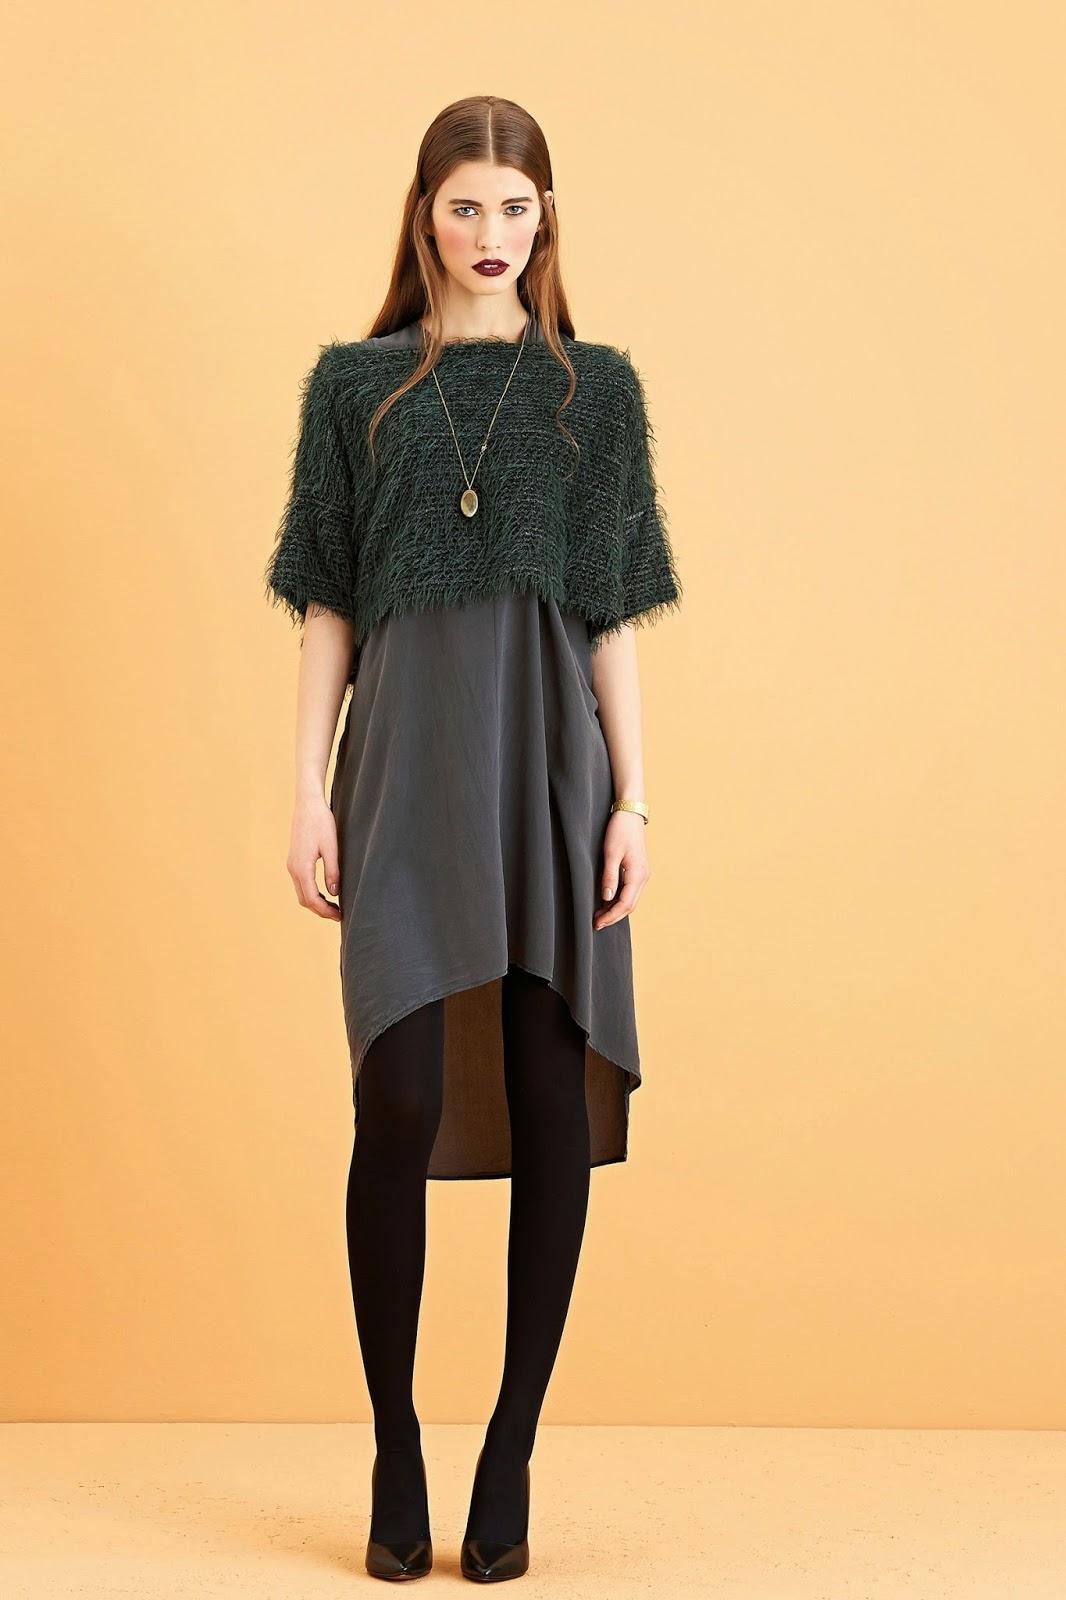 OTTOD'AME, Firma Italiana, Fashion Style, New Collection,  Looks, Cool, VIntage Style, Drees, Skirt, Pants, Blog de Moda